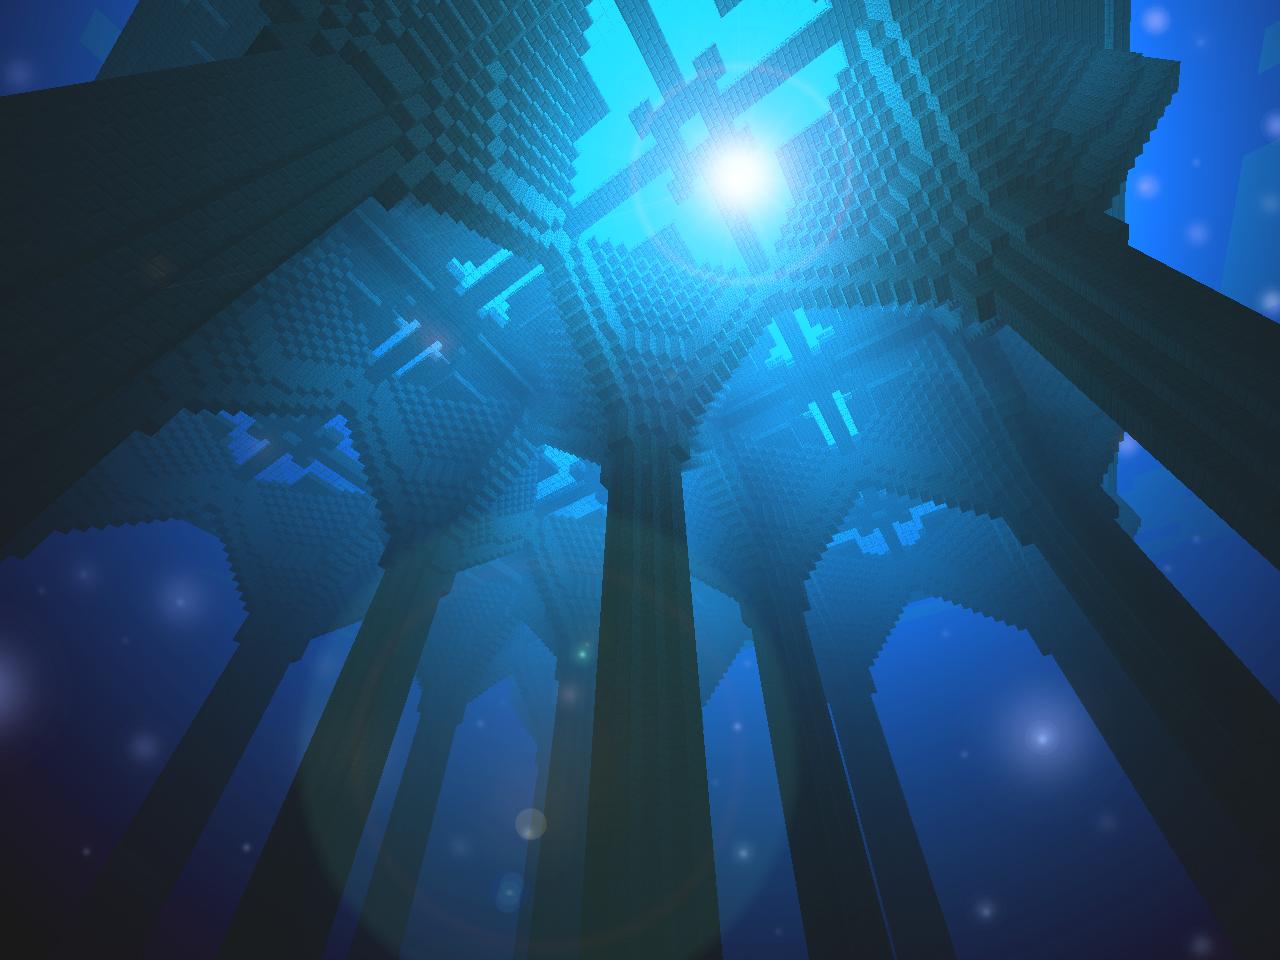 Deep Underwater Wallpaper HD Backgroun 1280x960